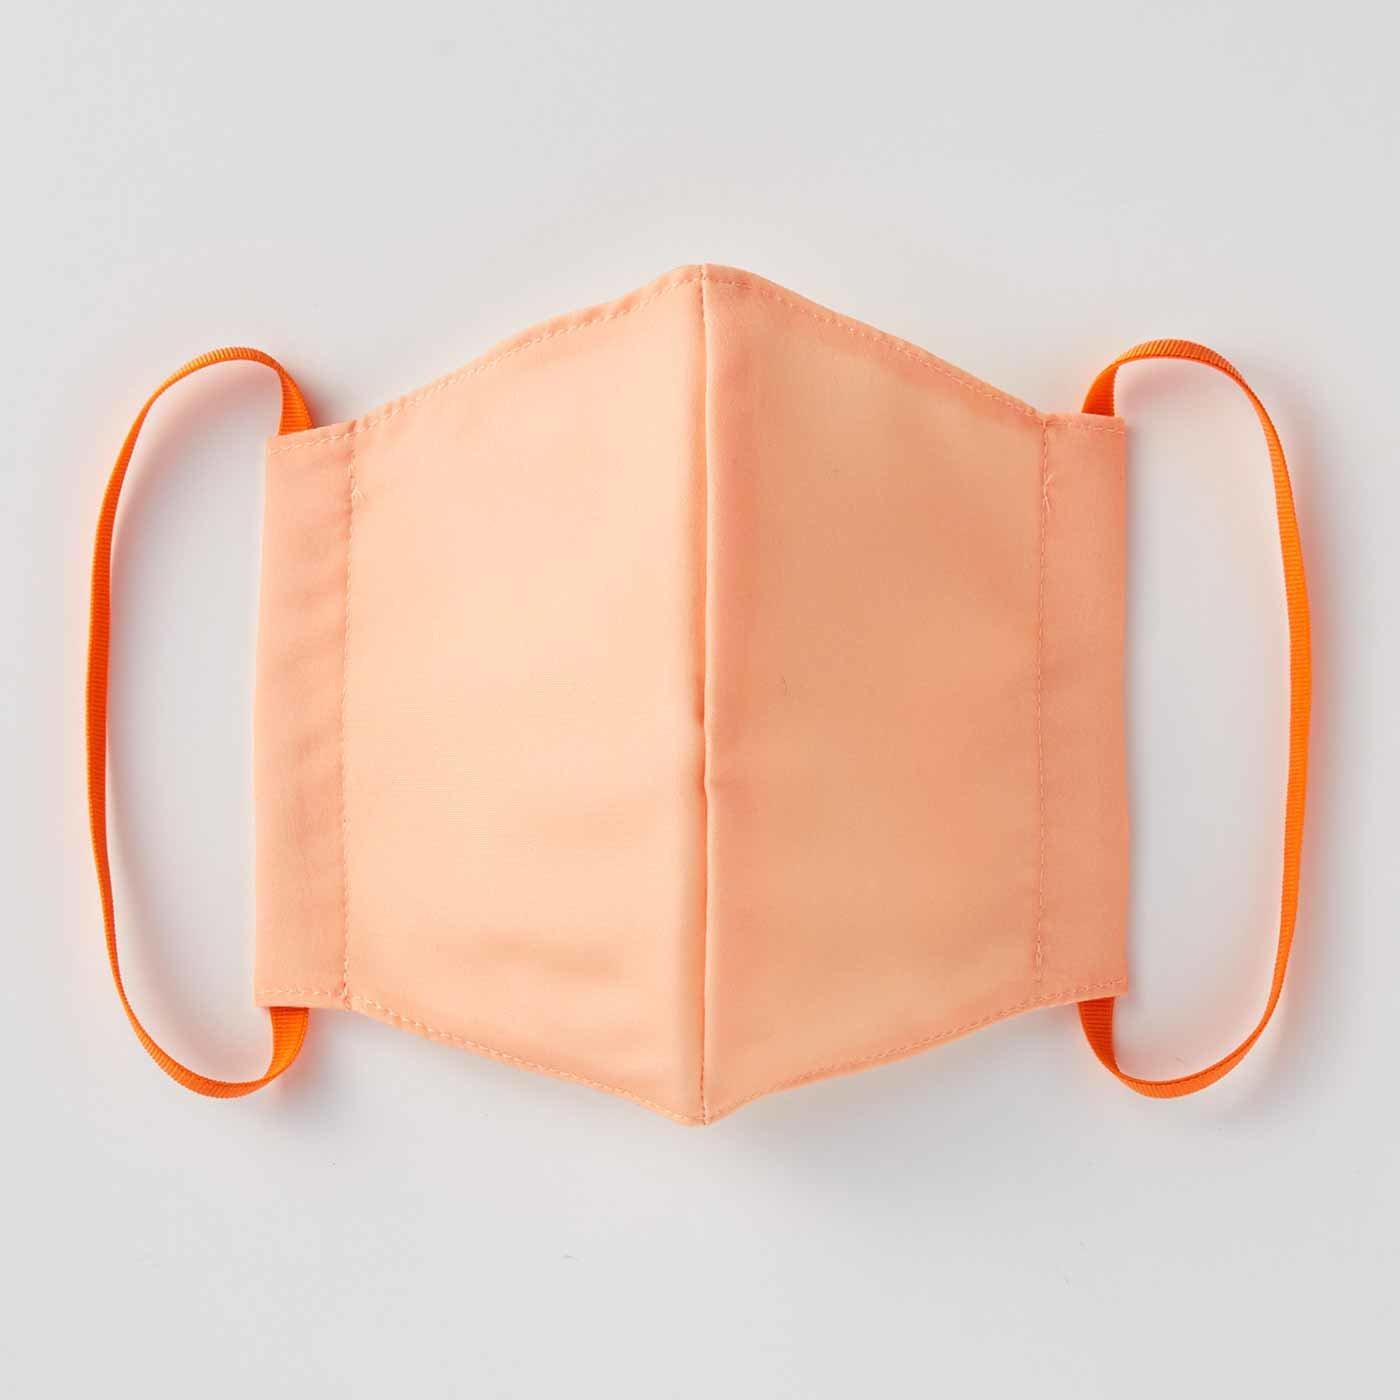 OSYAIRO UVカットのキレイカラーマスク〈オレンジ〉